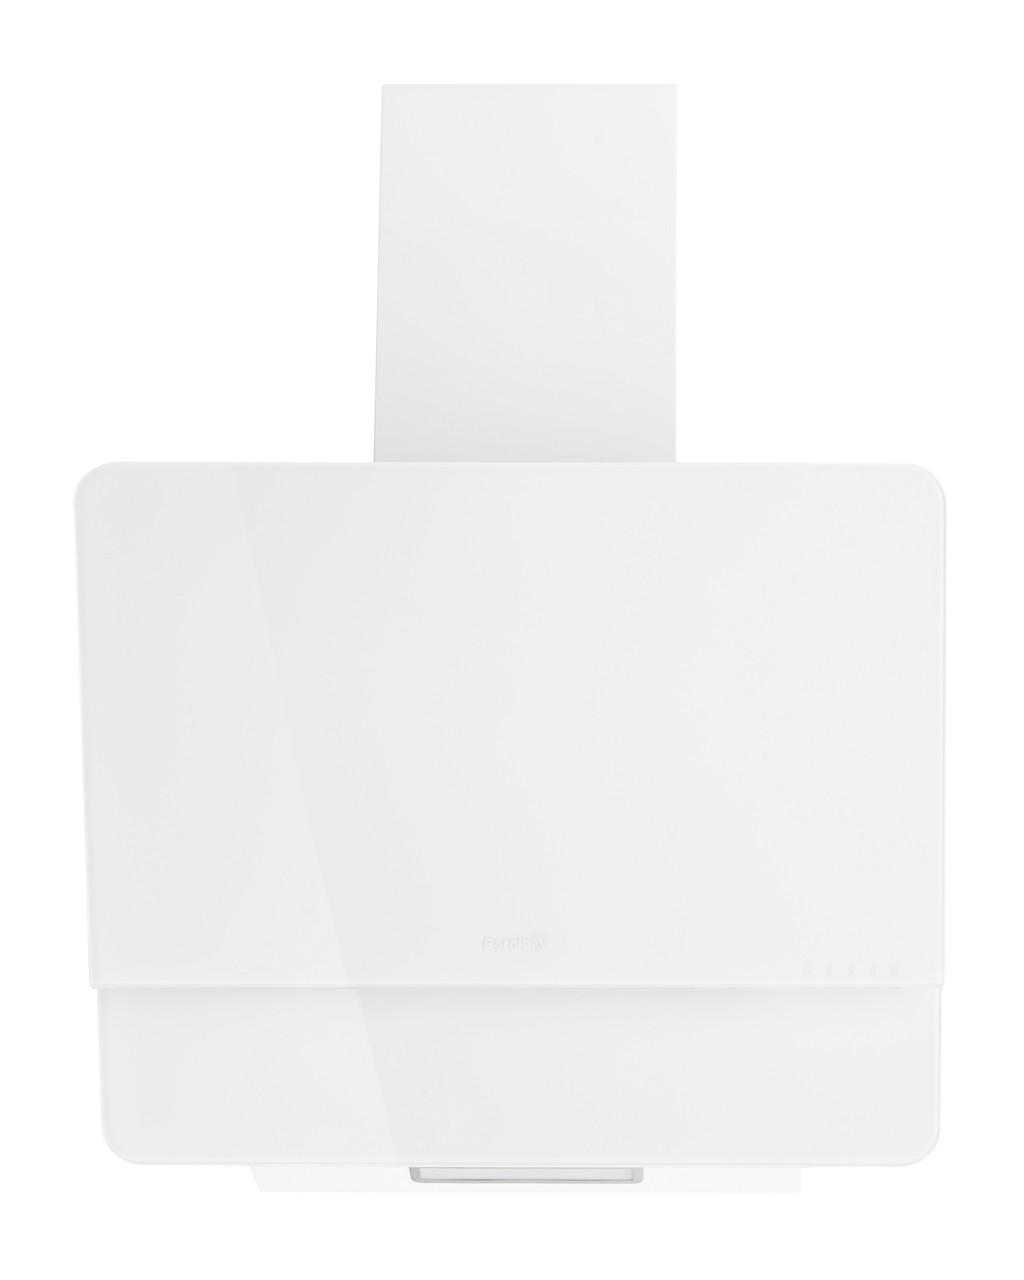 Кухонна витяжка похила BORGIO RNT-CR 60 white (скло)